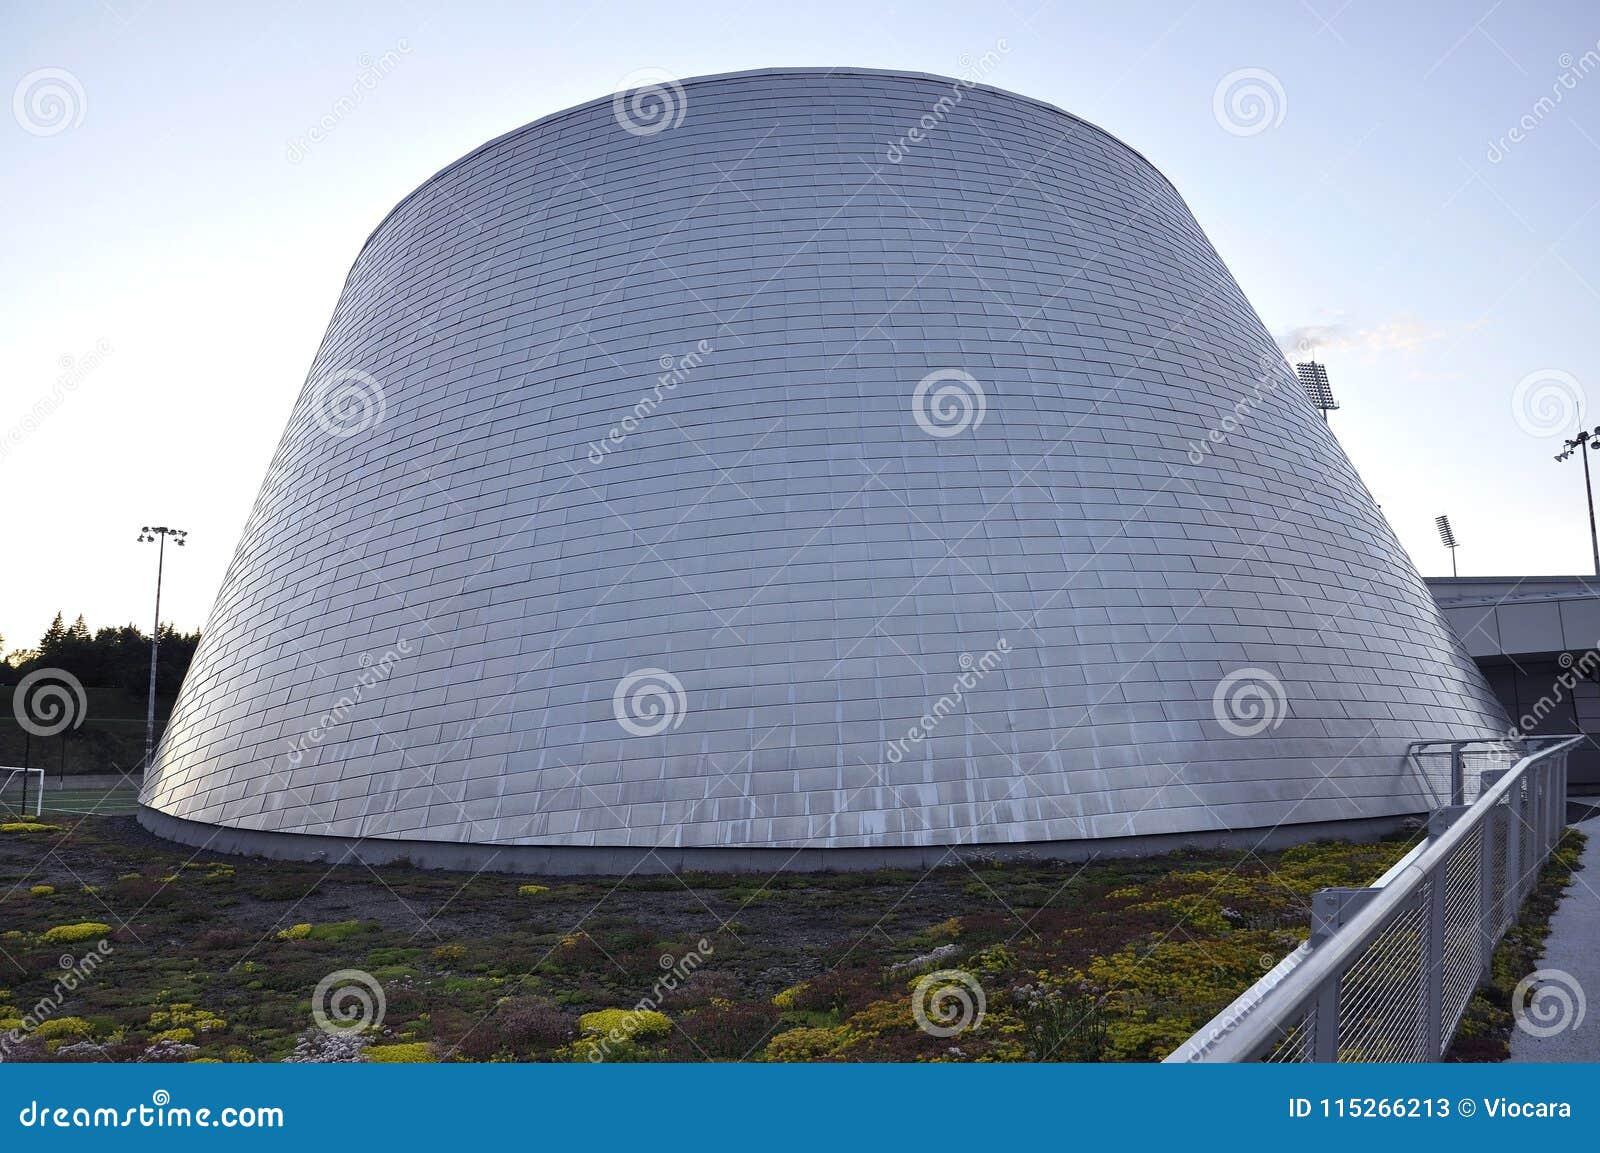 Montreal, o 27 de junho: Parque olímpico com Rio Tinto Alcan Planetarium de Montreal na província de Quebeque de Canadá